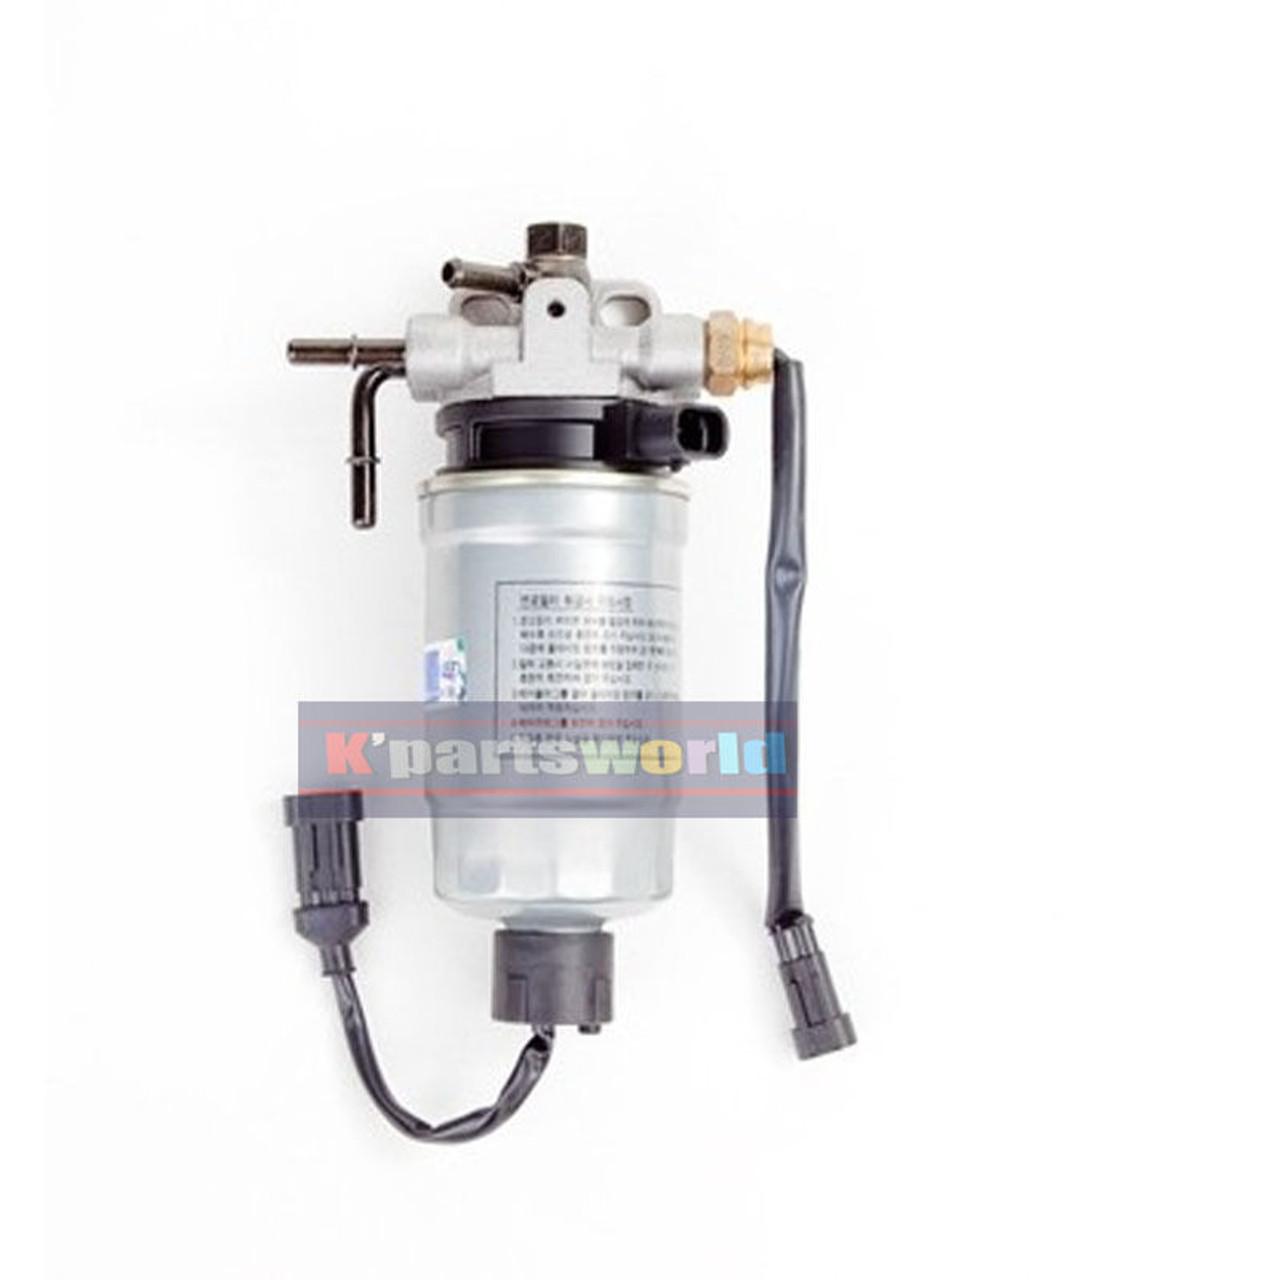 medium resolution of fuel filter water separator assy 319703e10a 31970 3e10a for kia sorento 2004 09